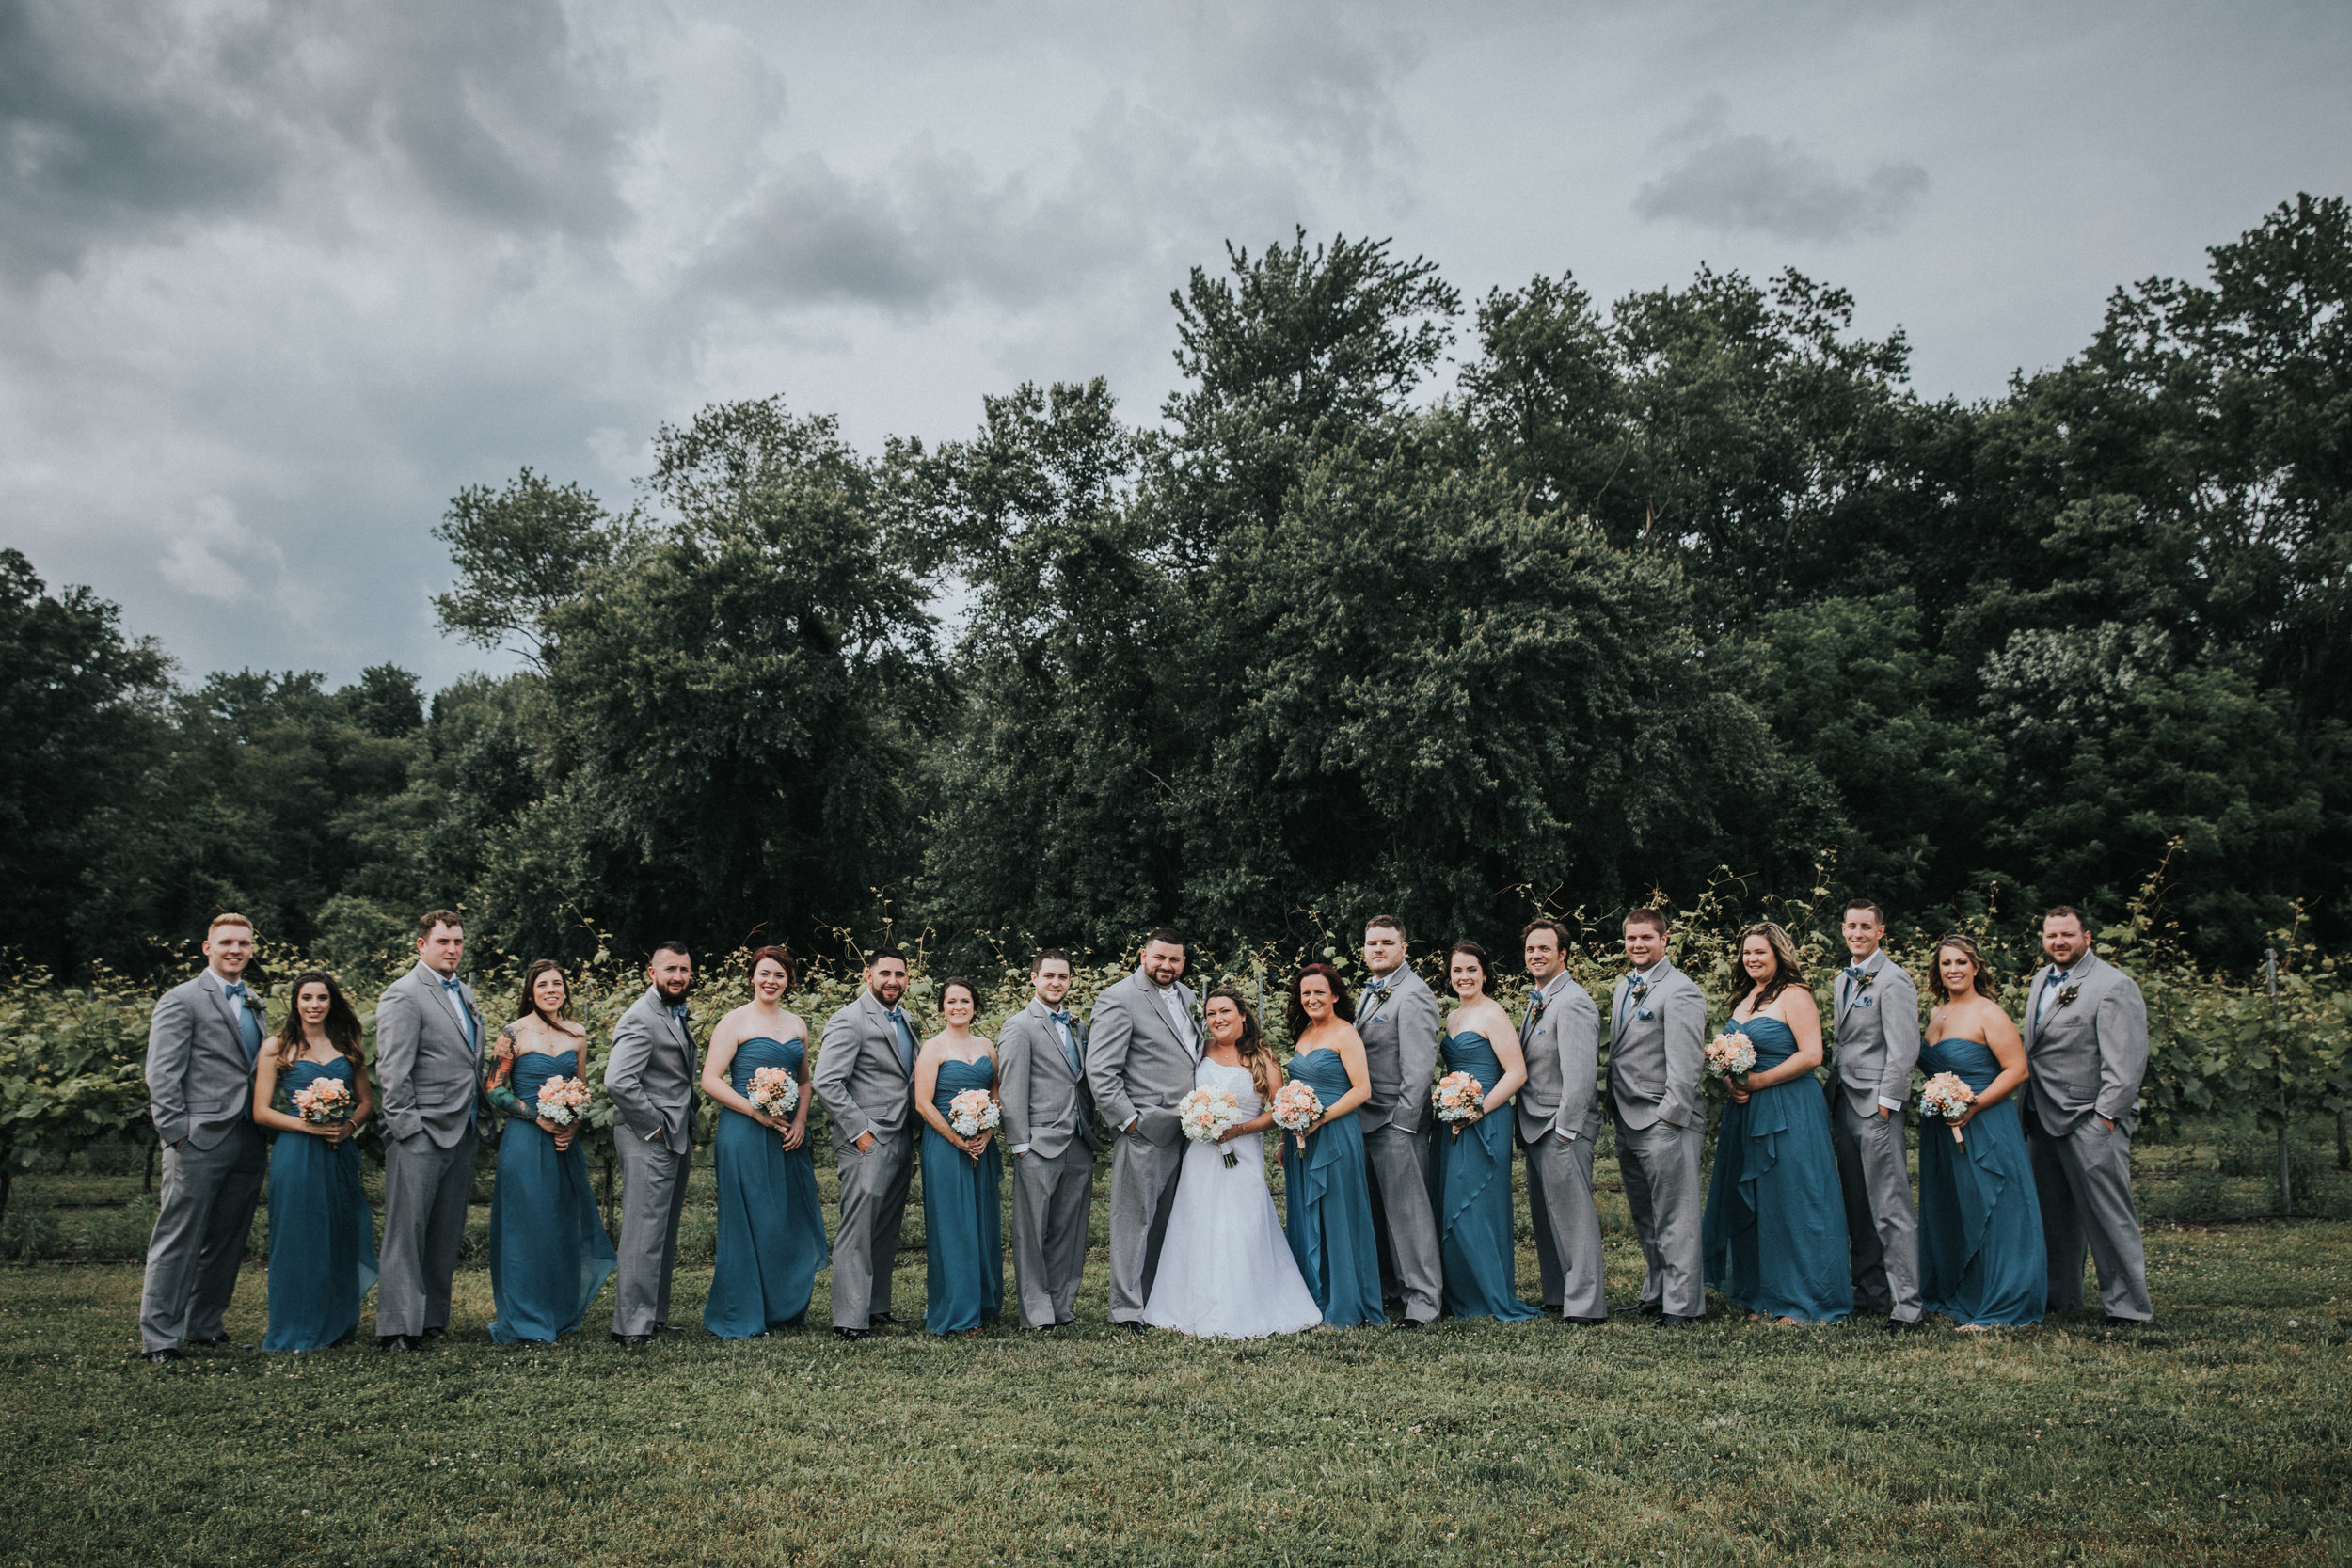 New-Jersey-Wedding-Photographer-JennaLynnPhotography-ValenzanoWinery-BridalParty-2.jpg